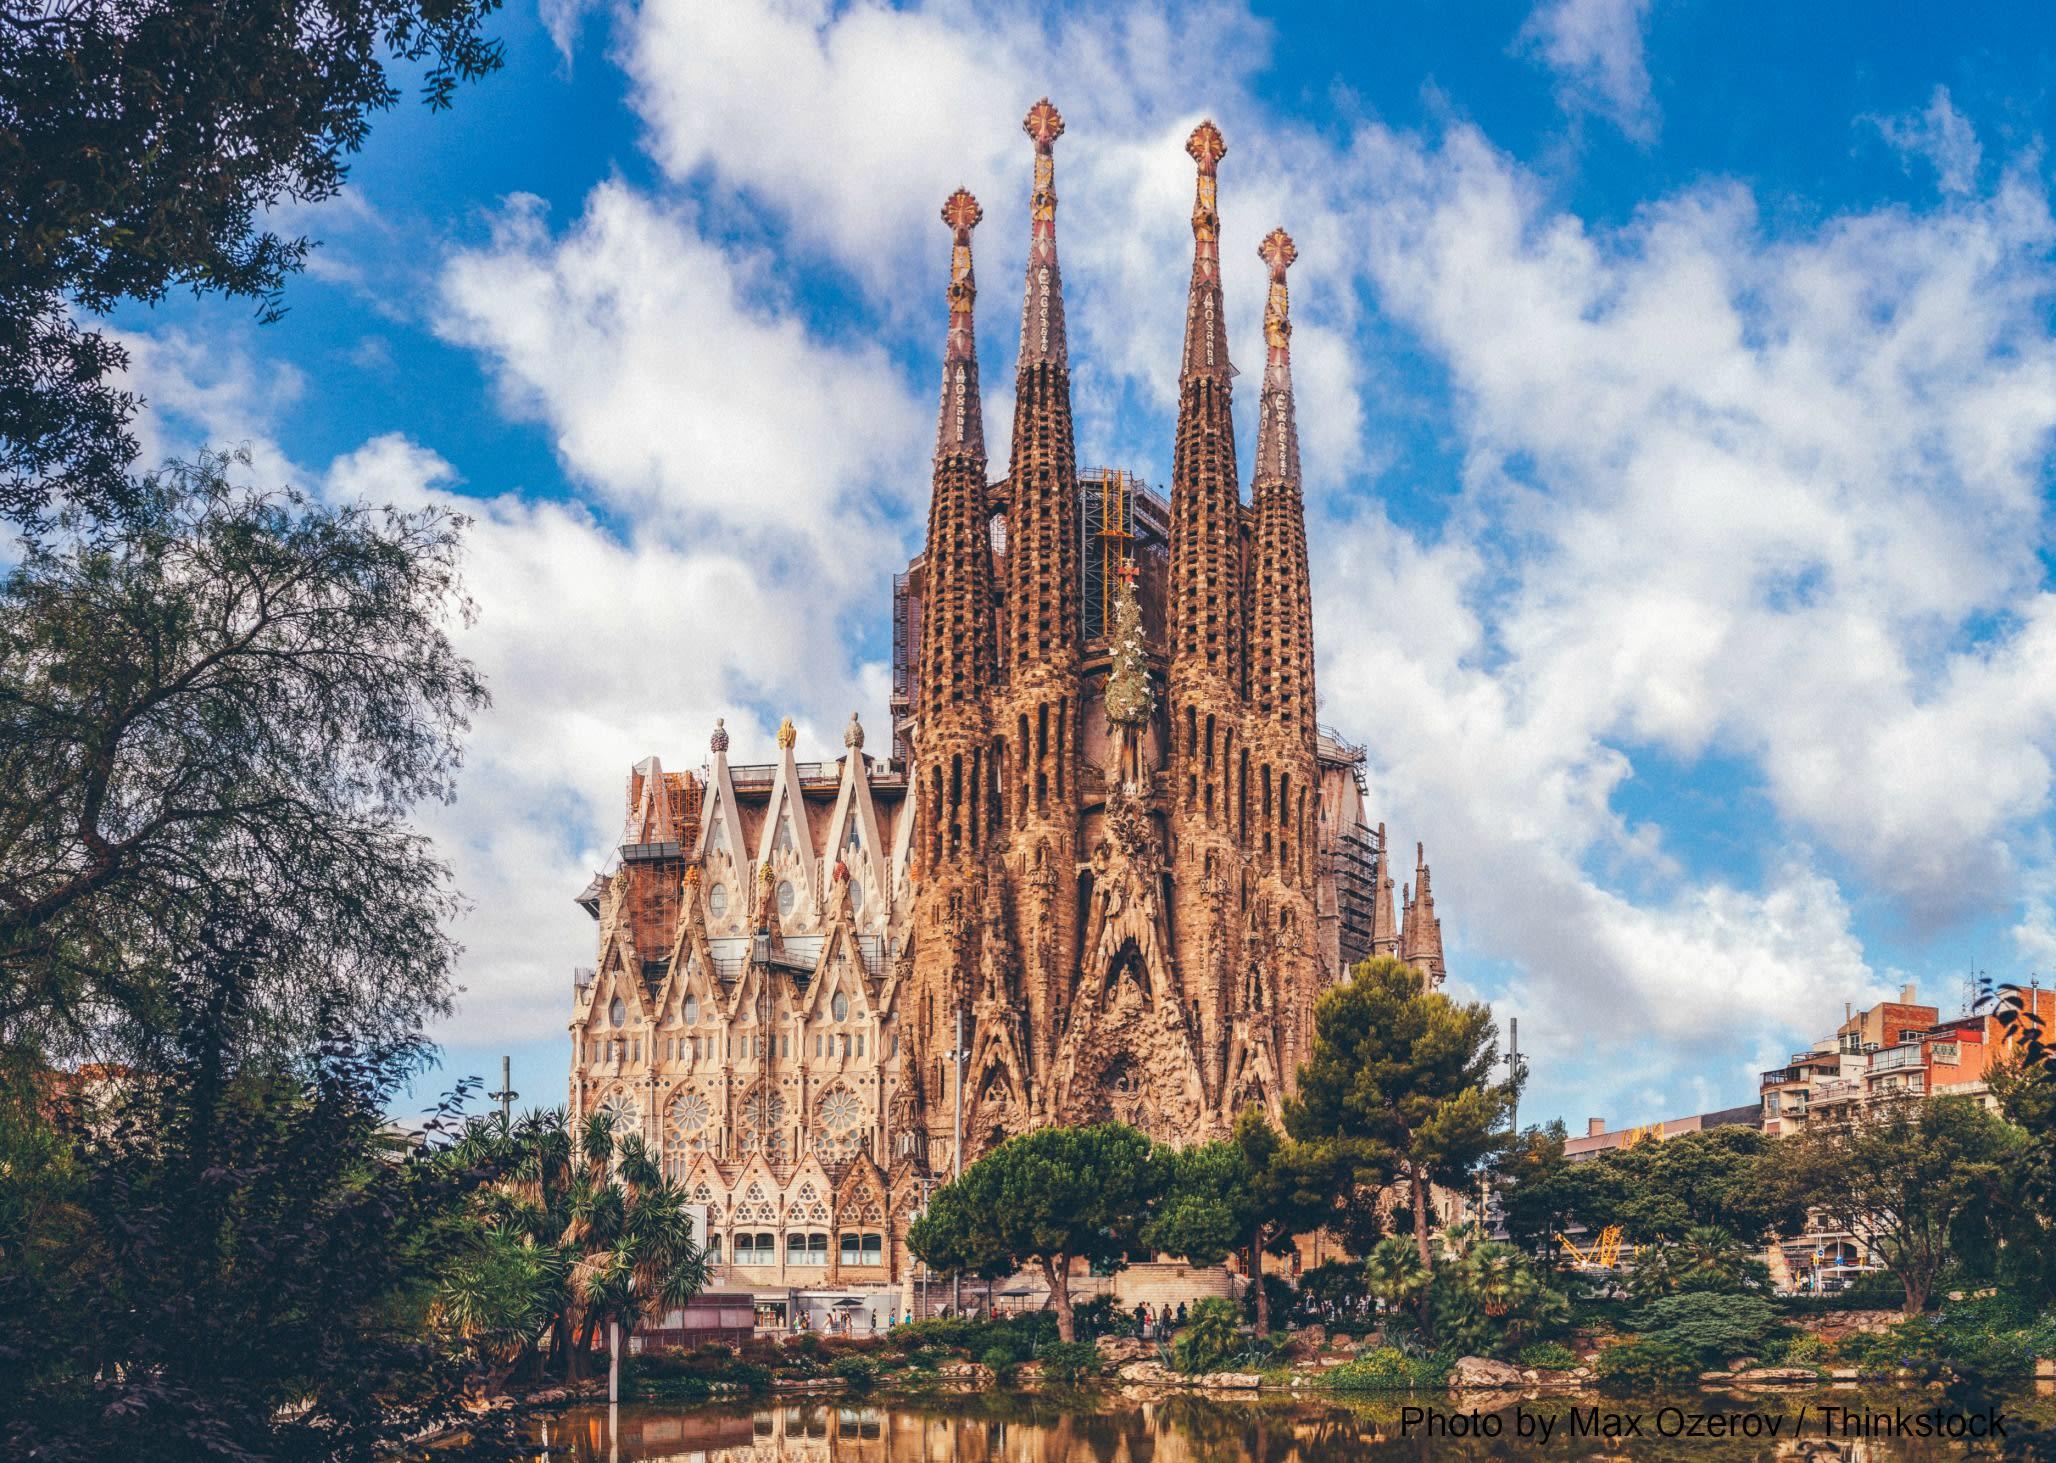 Visit the Sagrada de Familia, a popular Barcelona attraction